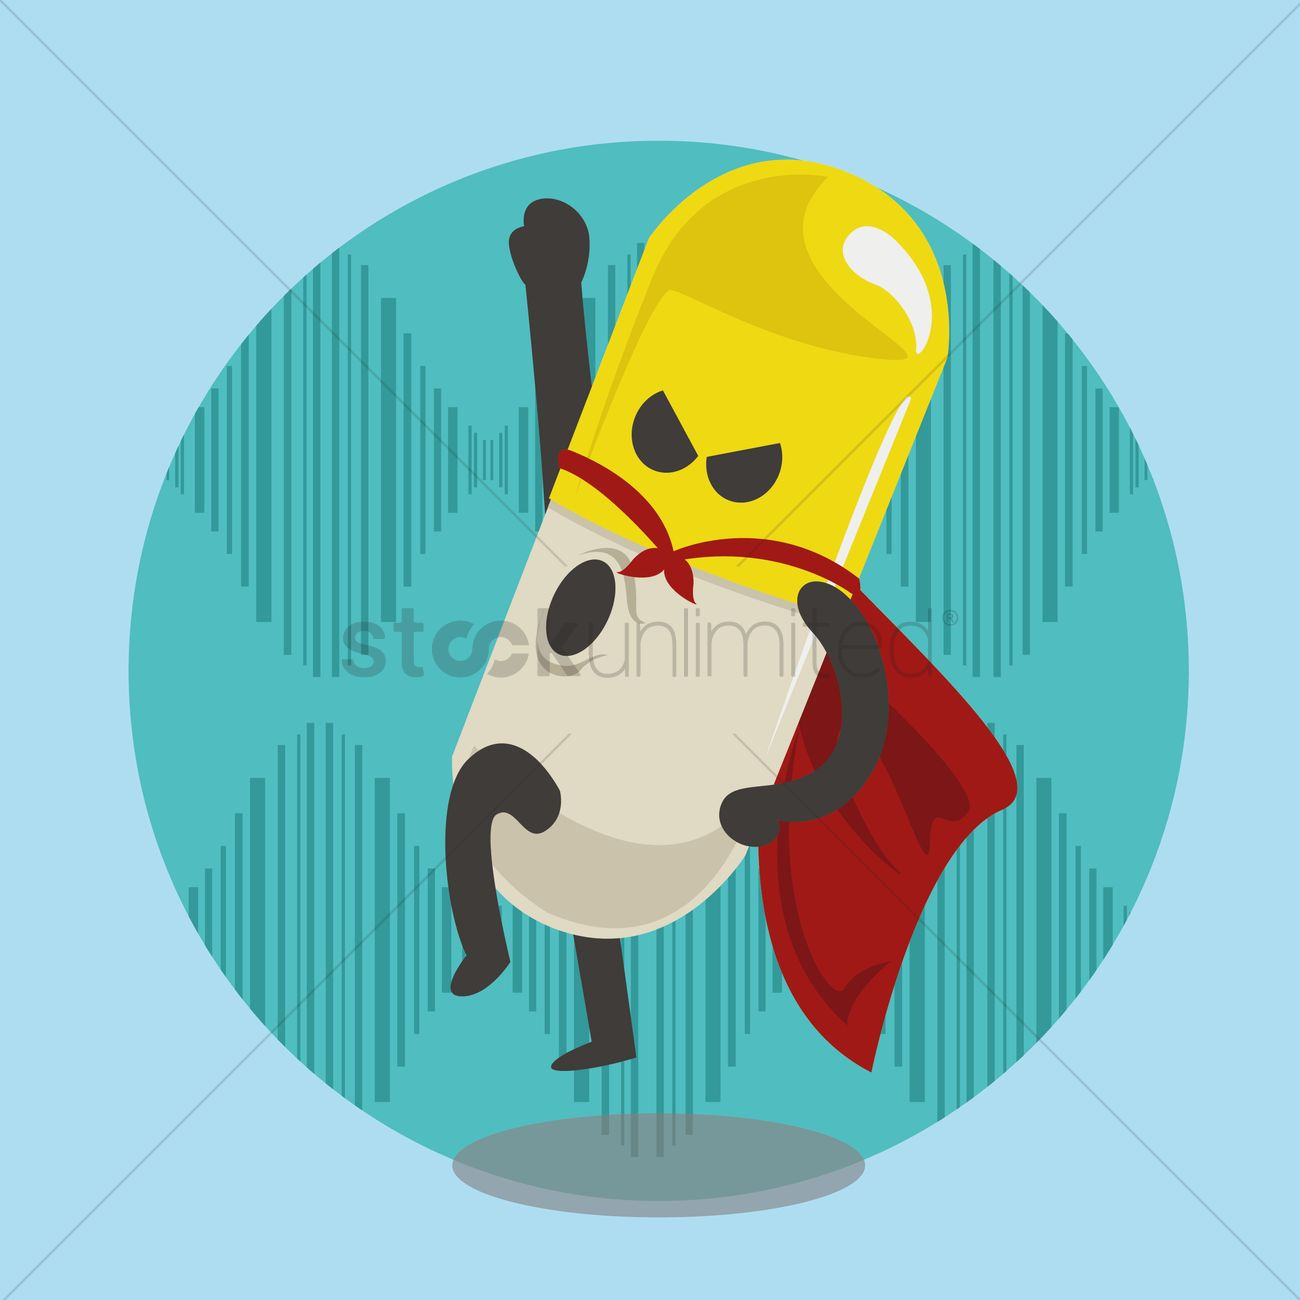 1300x1300 Superhero Pill Cartoon With Cape Vector Image